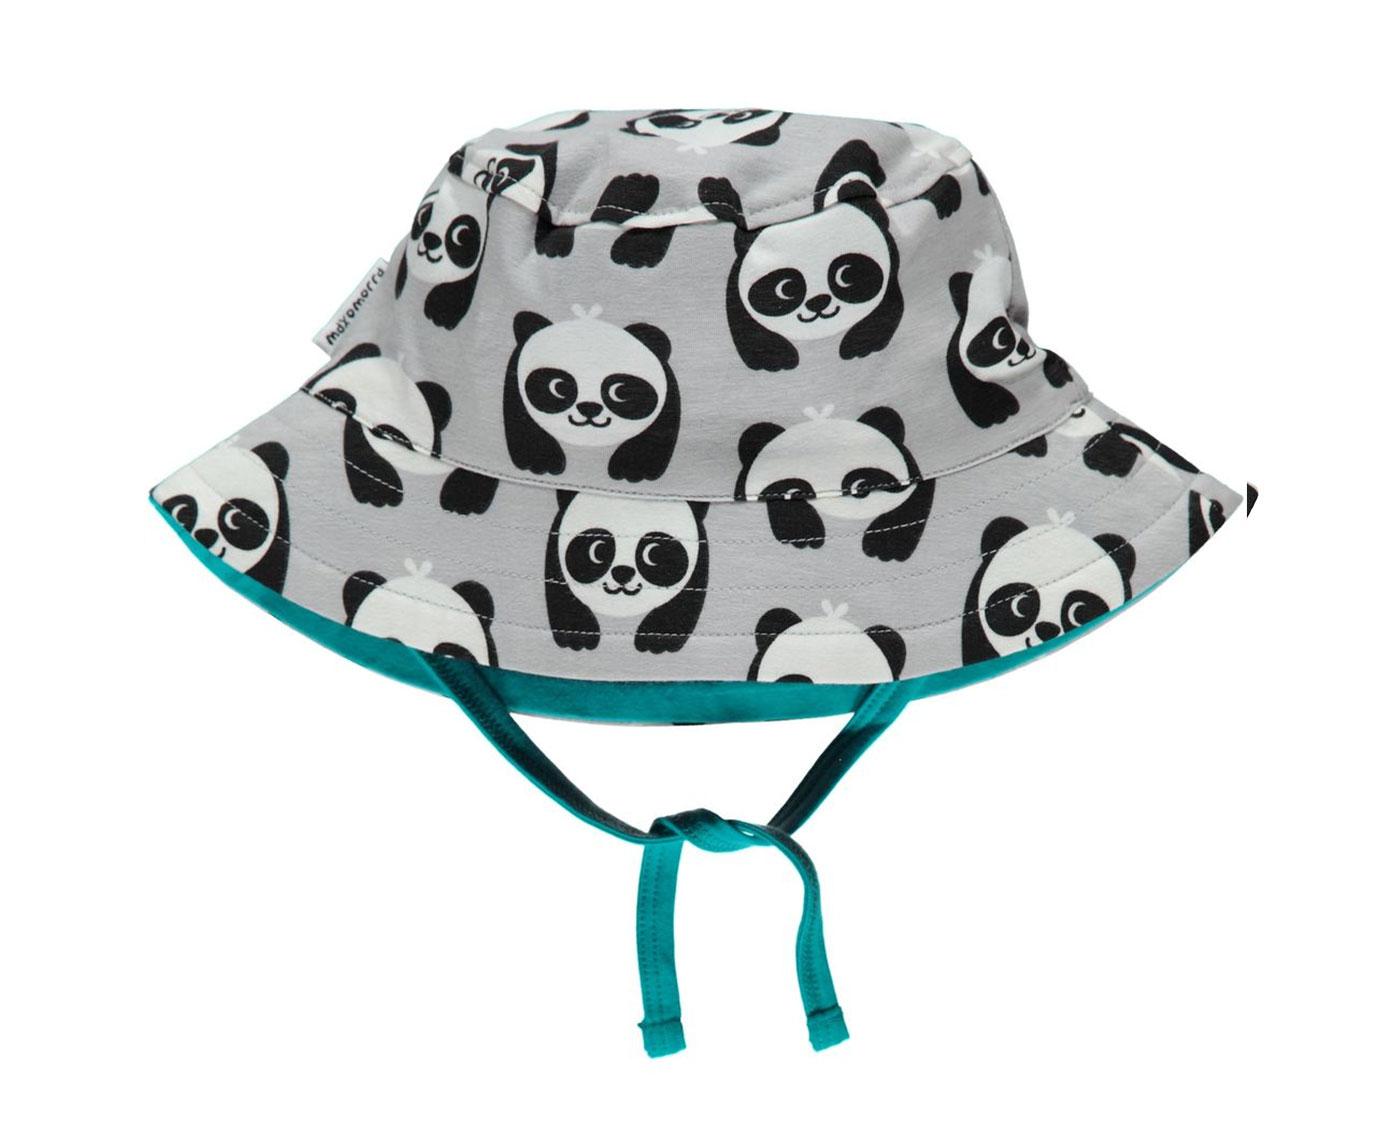 Zonnehoedje 'Panda' *8-24 maanden*